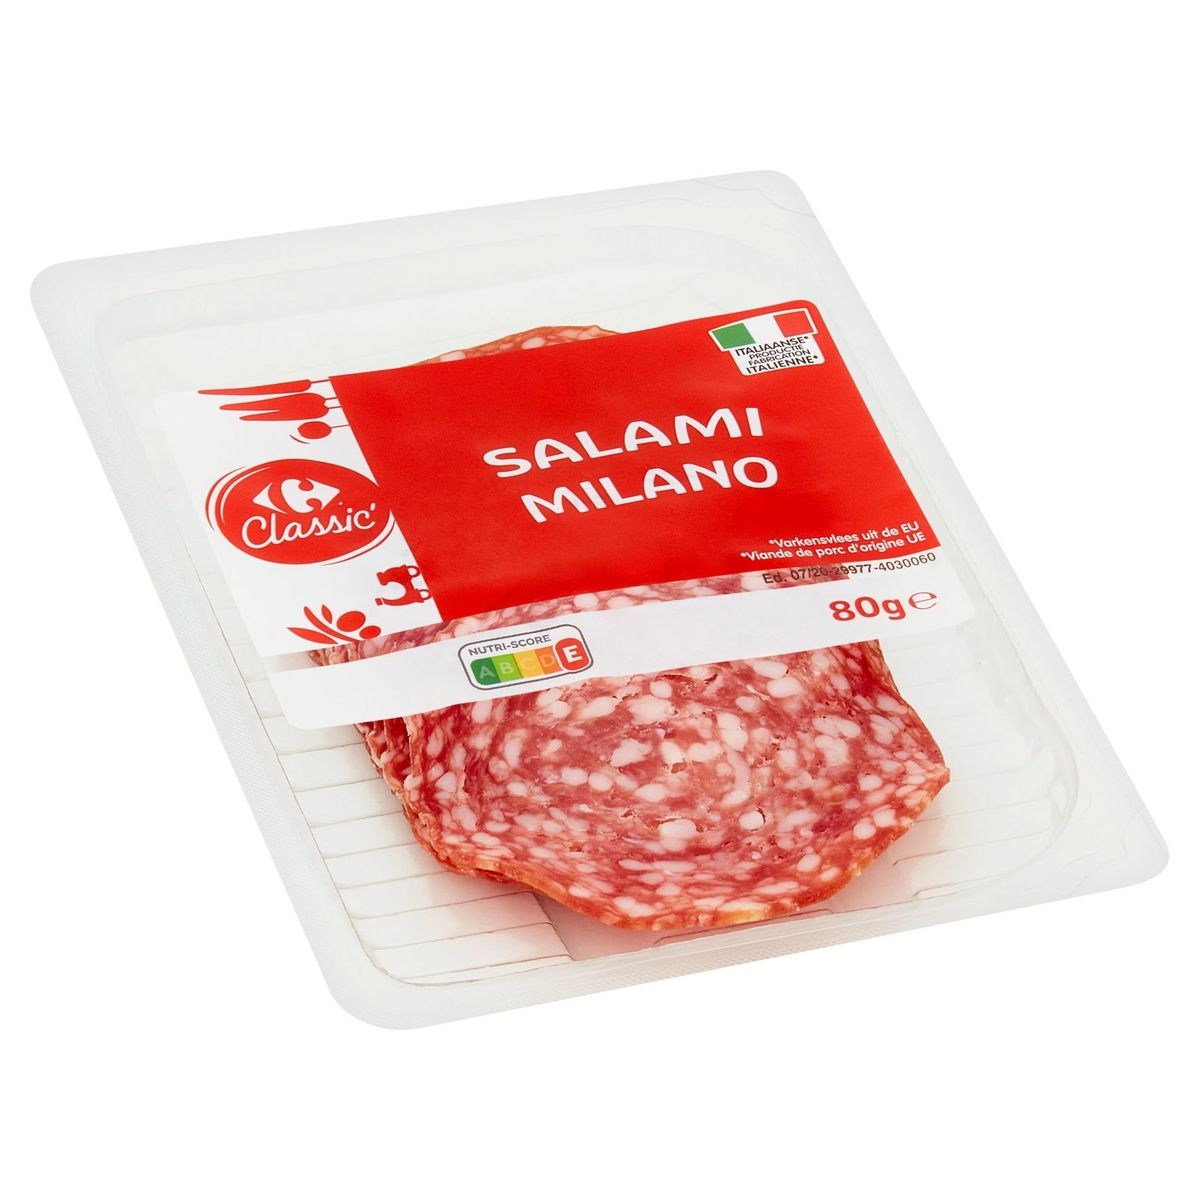 Carrefour Classic' Salami Milano 80 g